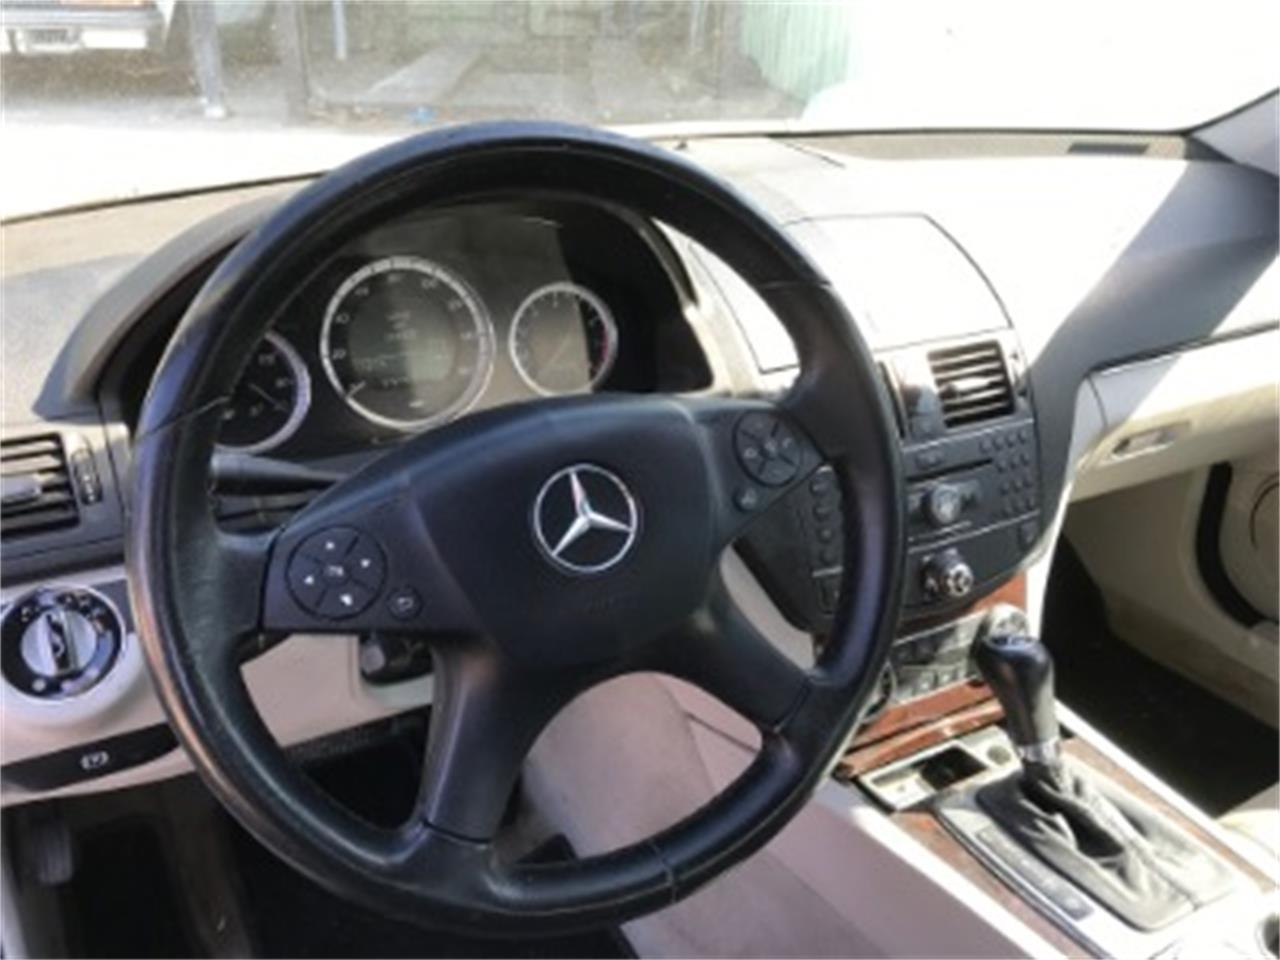 2009 Mercedes-Benz C-Class (CC-1313478) for sale in Miami, Florida